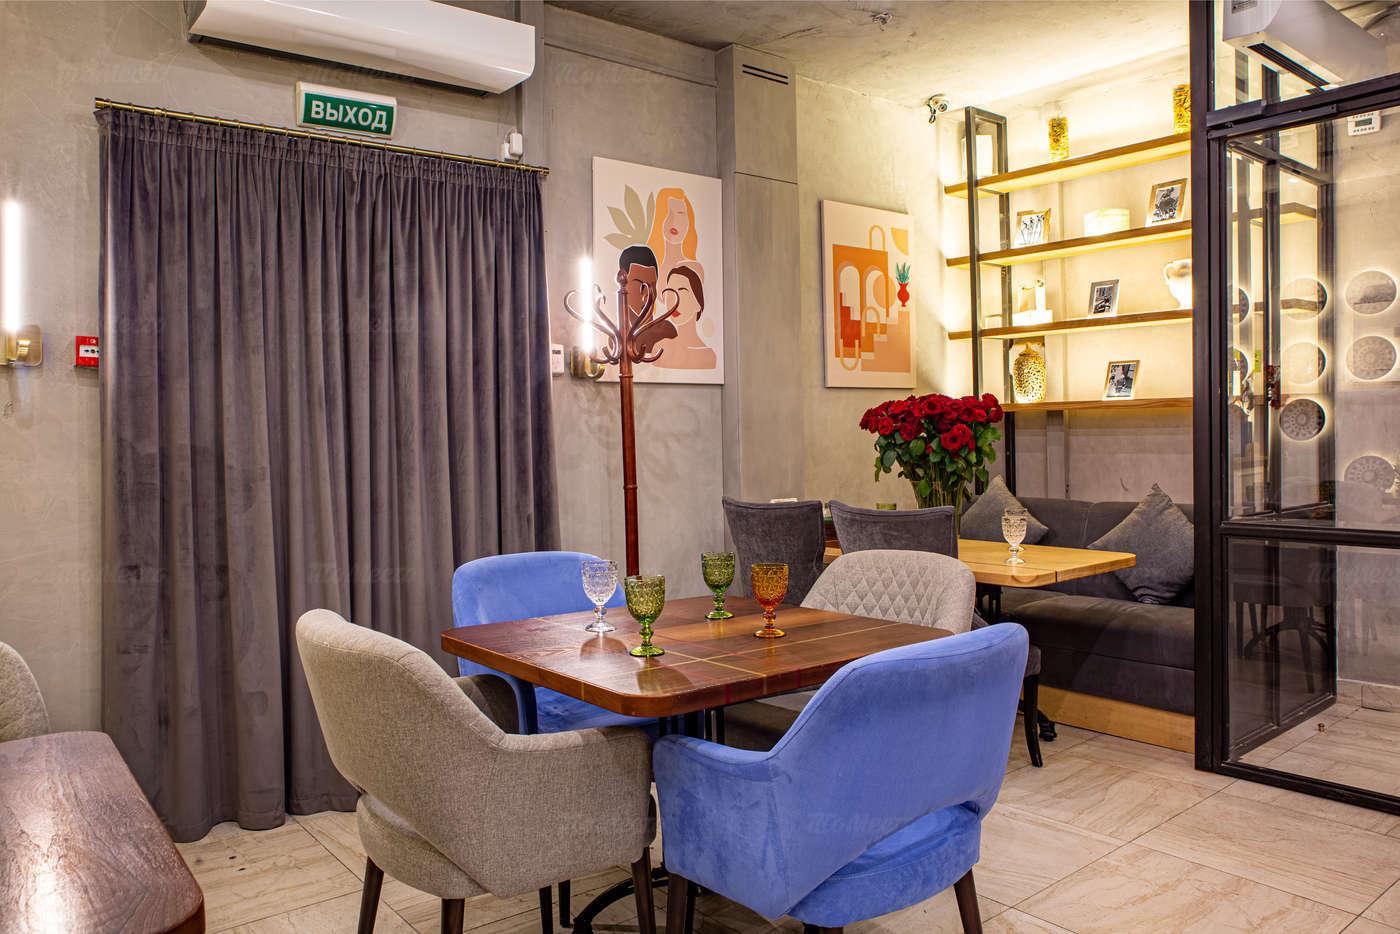 Ресторан IL LETTERATO (Литератор) в Петроверигском переулке фото 22